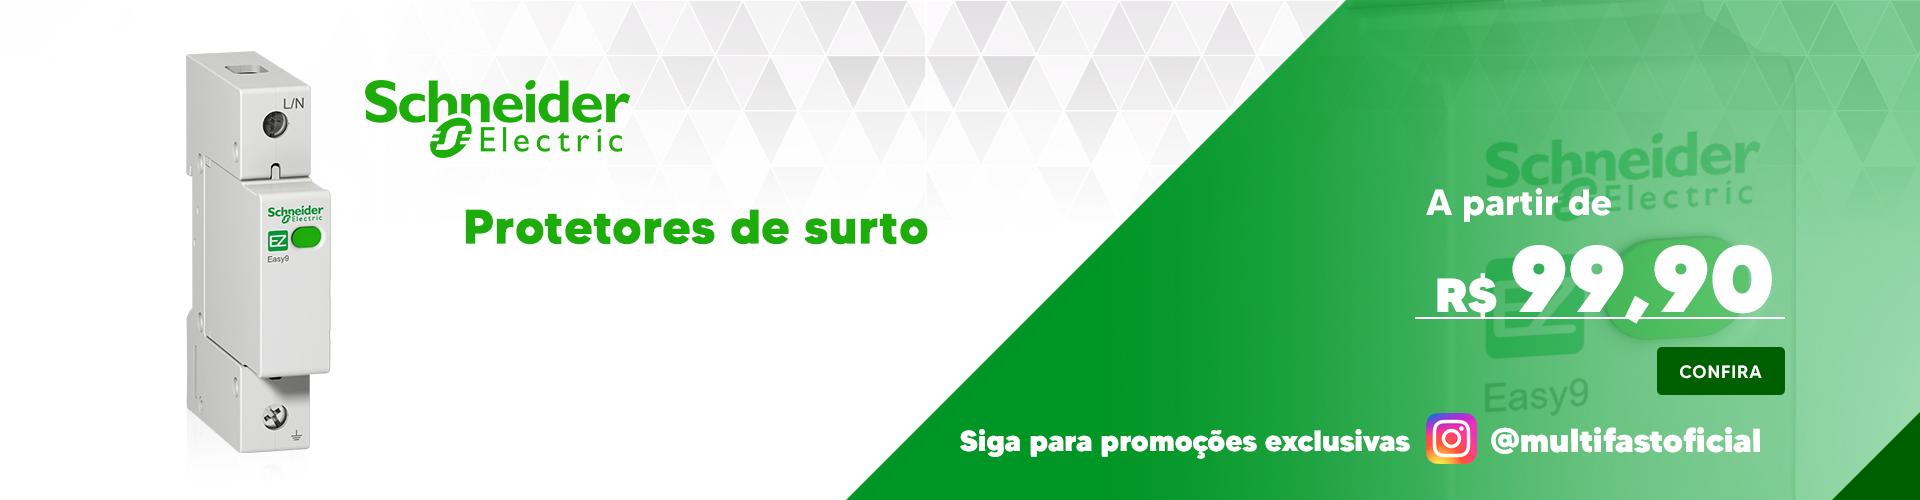 Banner Schneider Electric Protetor de Surto - Desktop